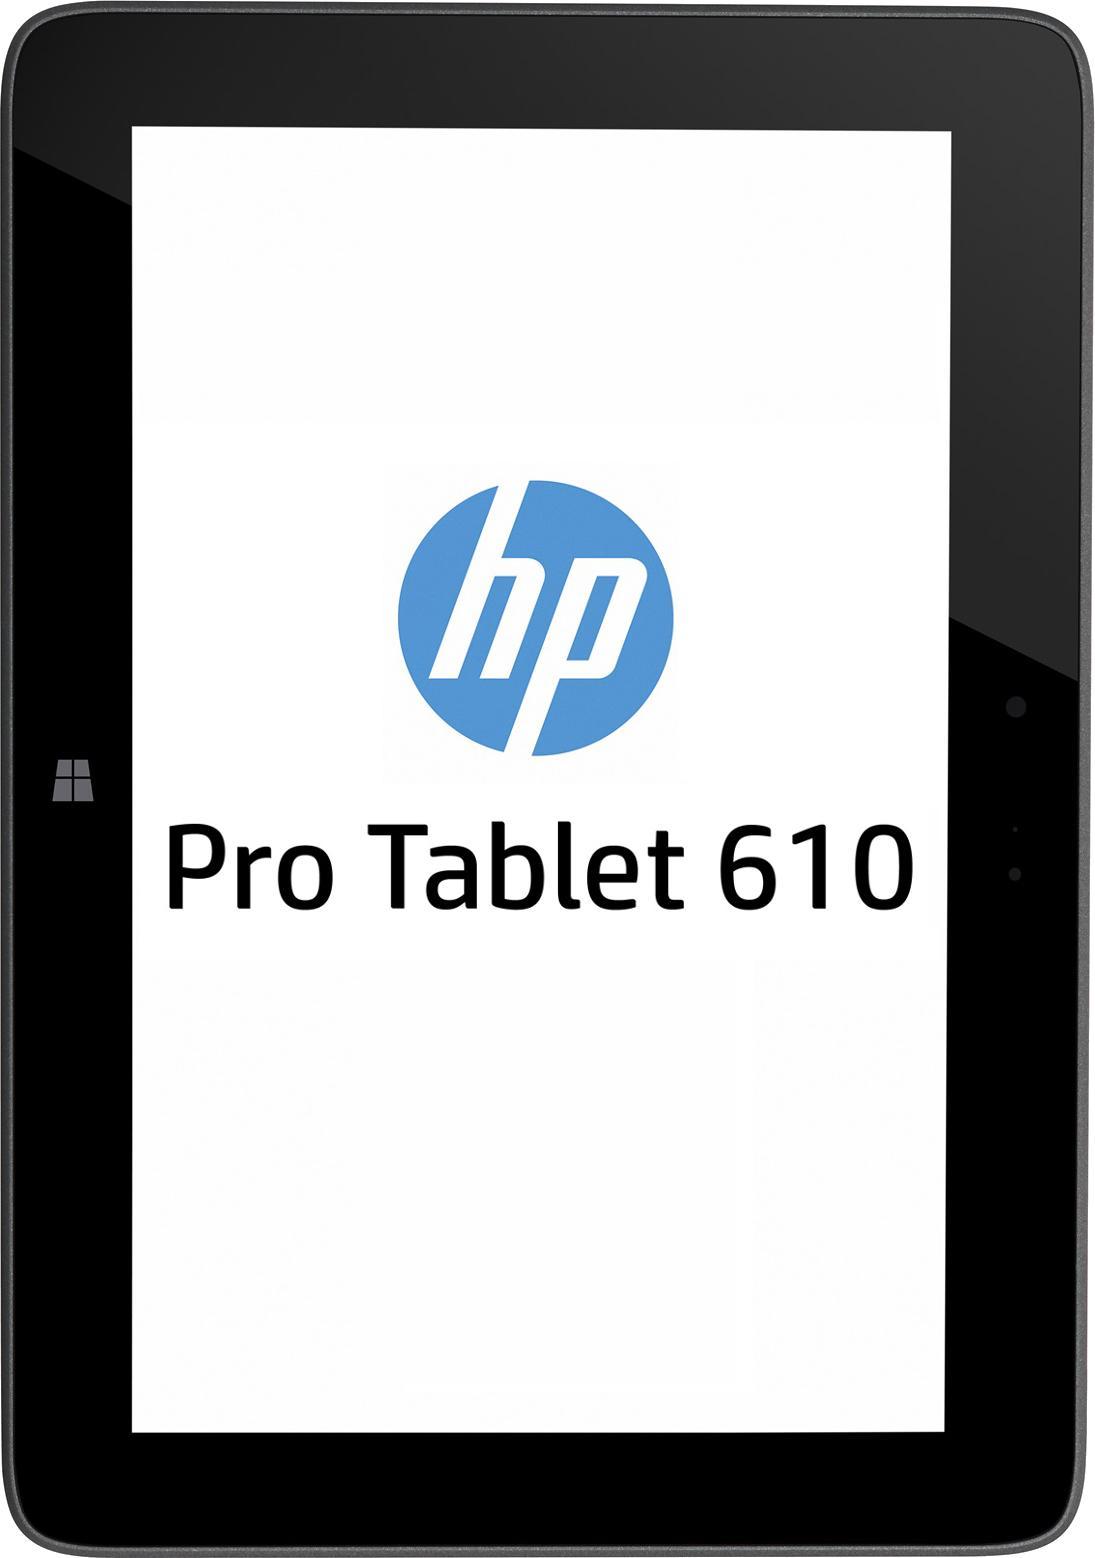 HP Pro Tablet 610 G1 PC (G4T86UT)